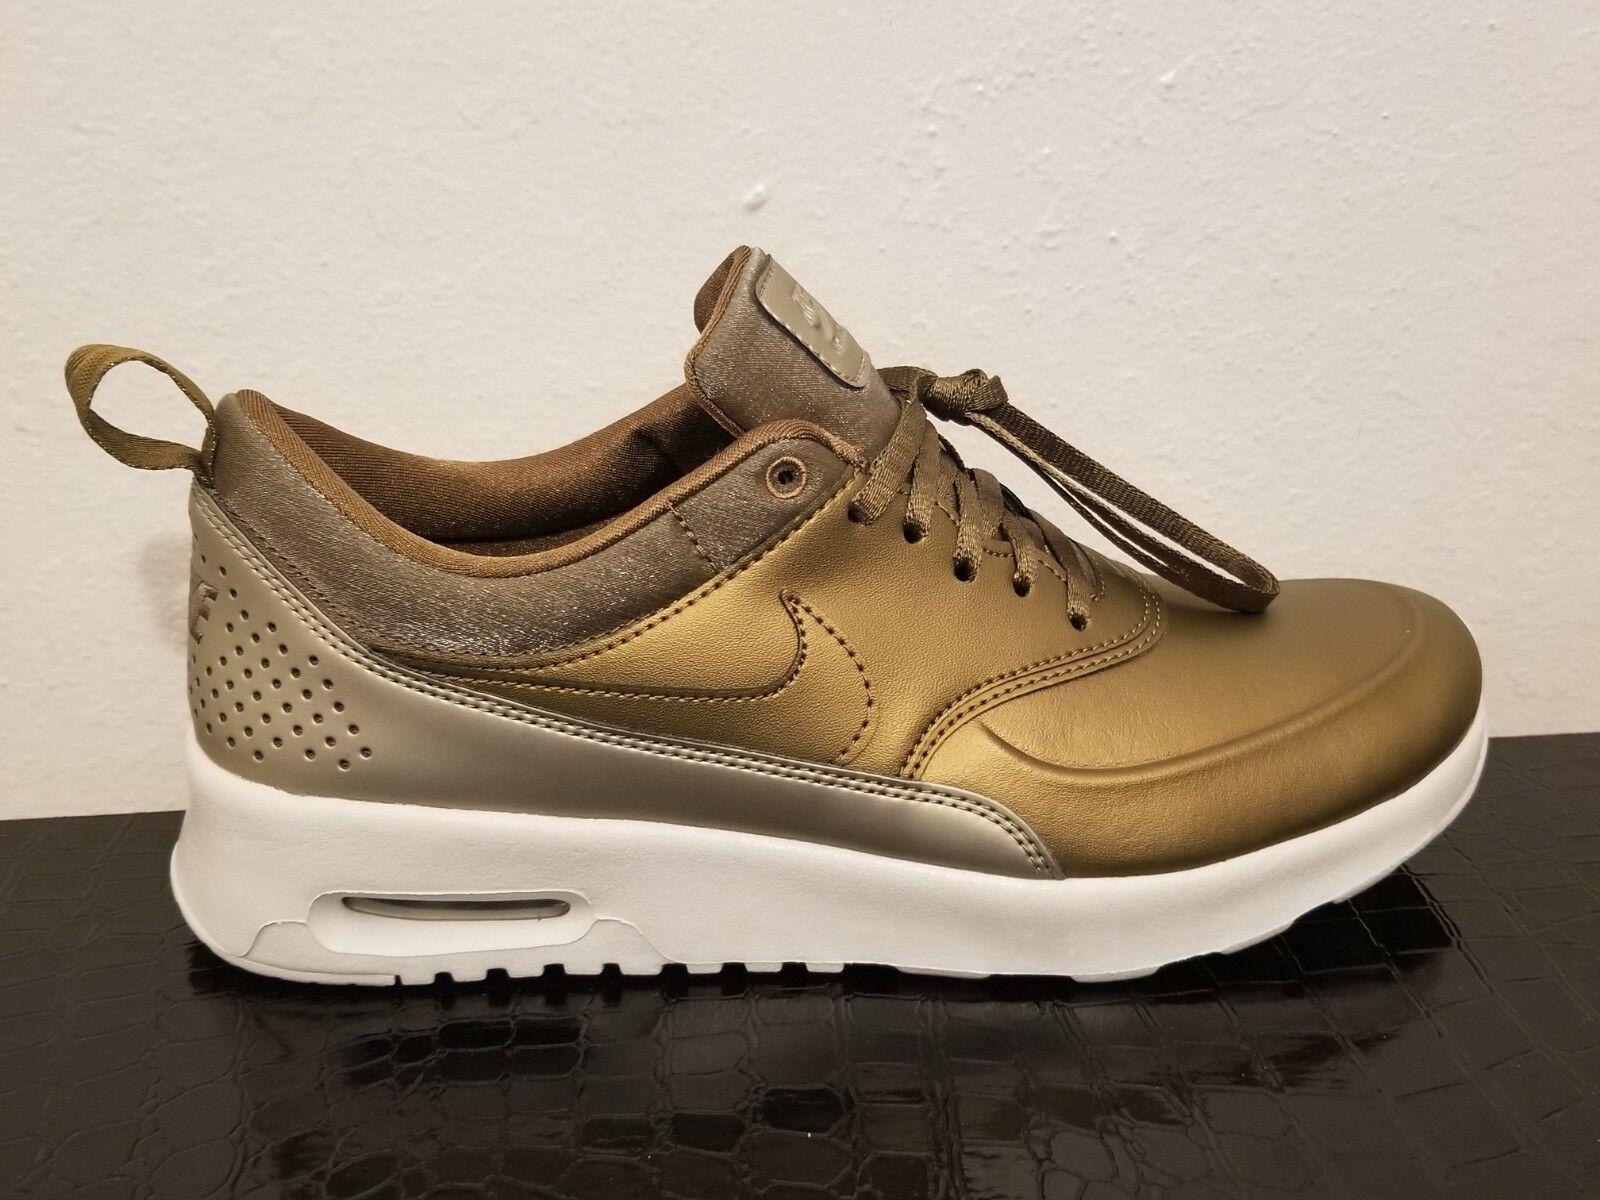 Nike Air Max Thea Premium Women Sneakers Metallic Field (616723-902) Size 7